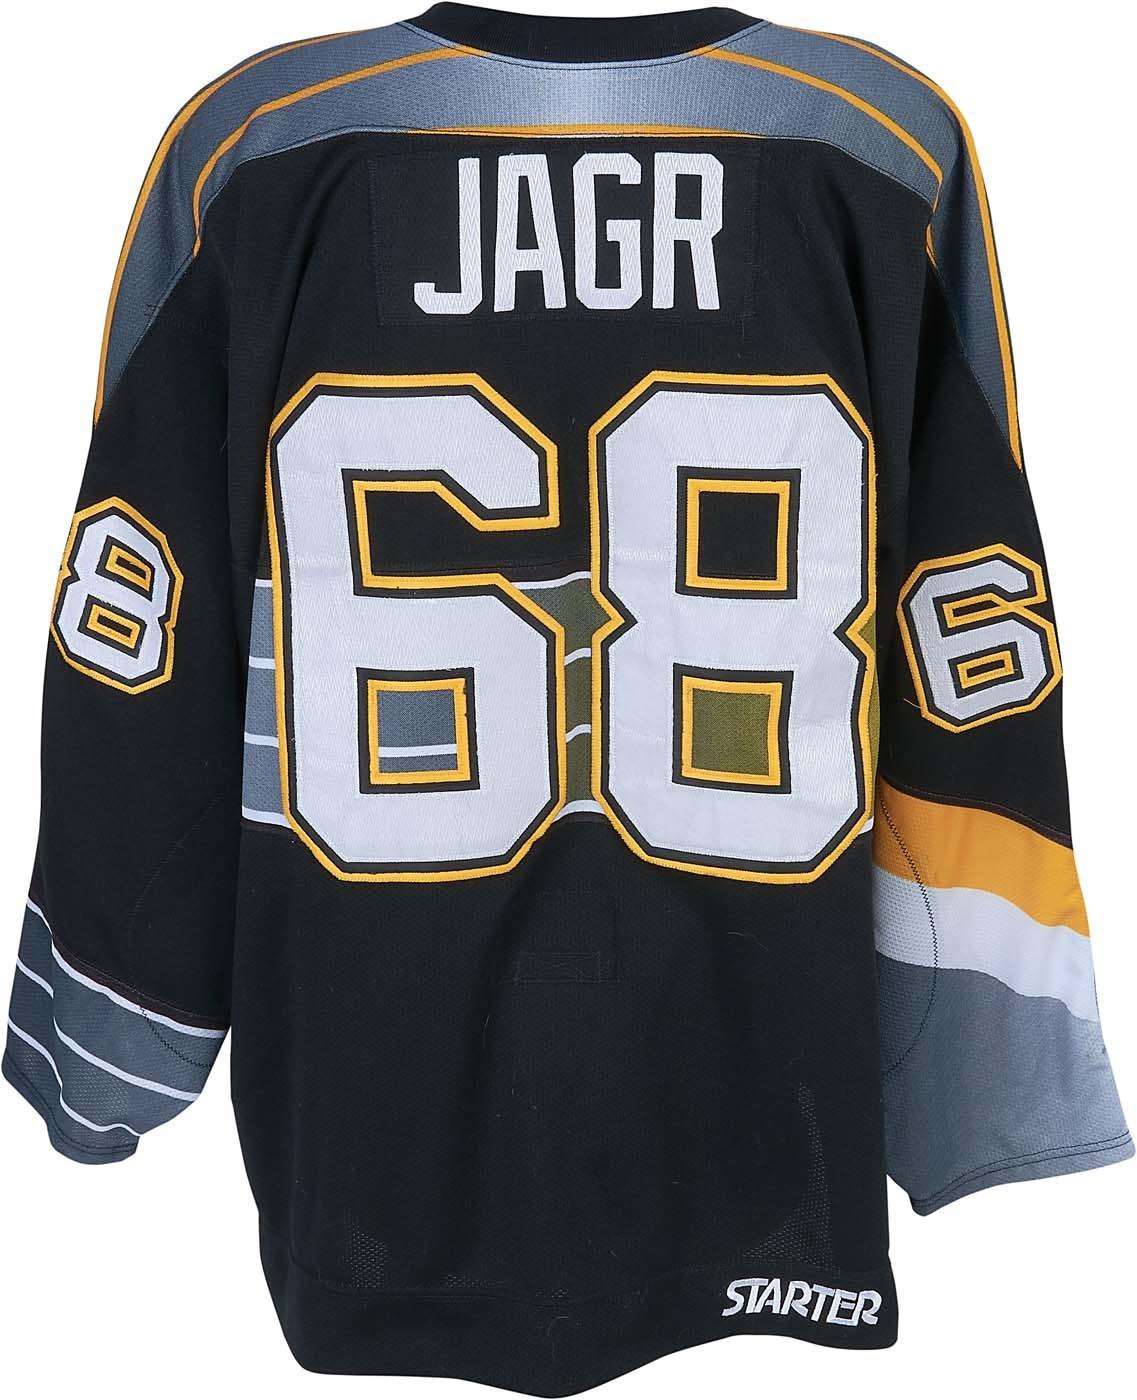 sports shoes aaf88 917a1 1997-98 Jaromir Jagr Pittsburgh Penguins Game Worn Jersey